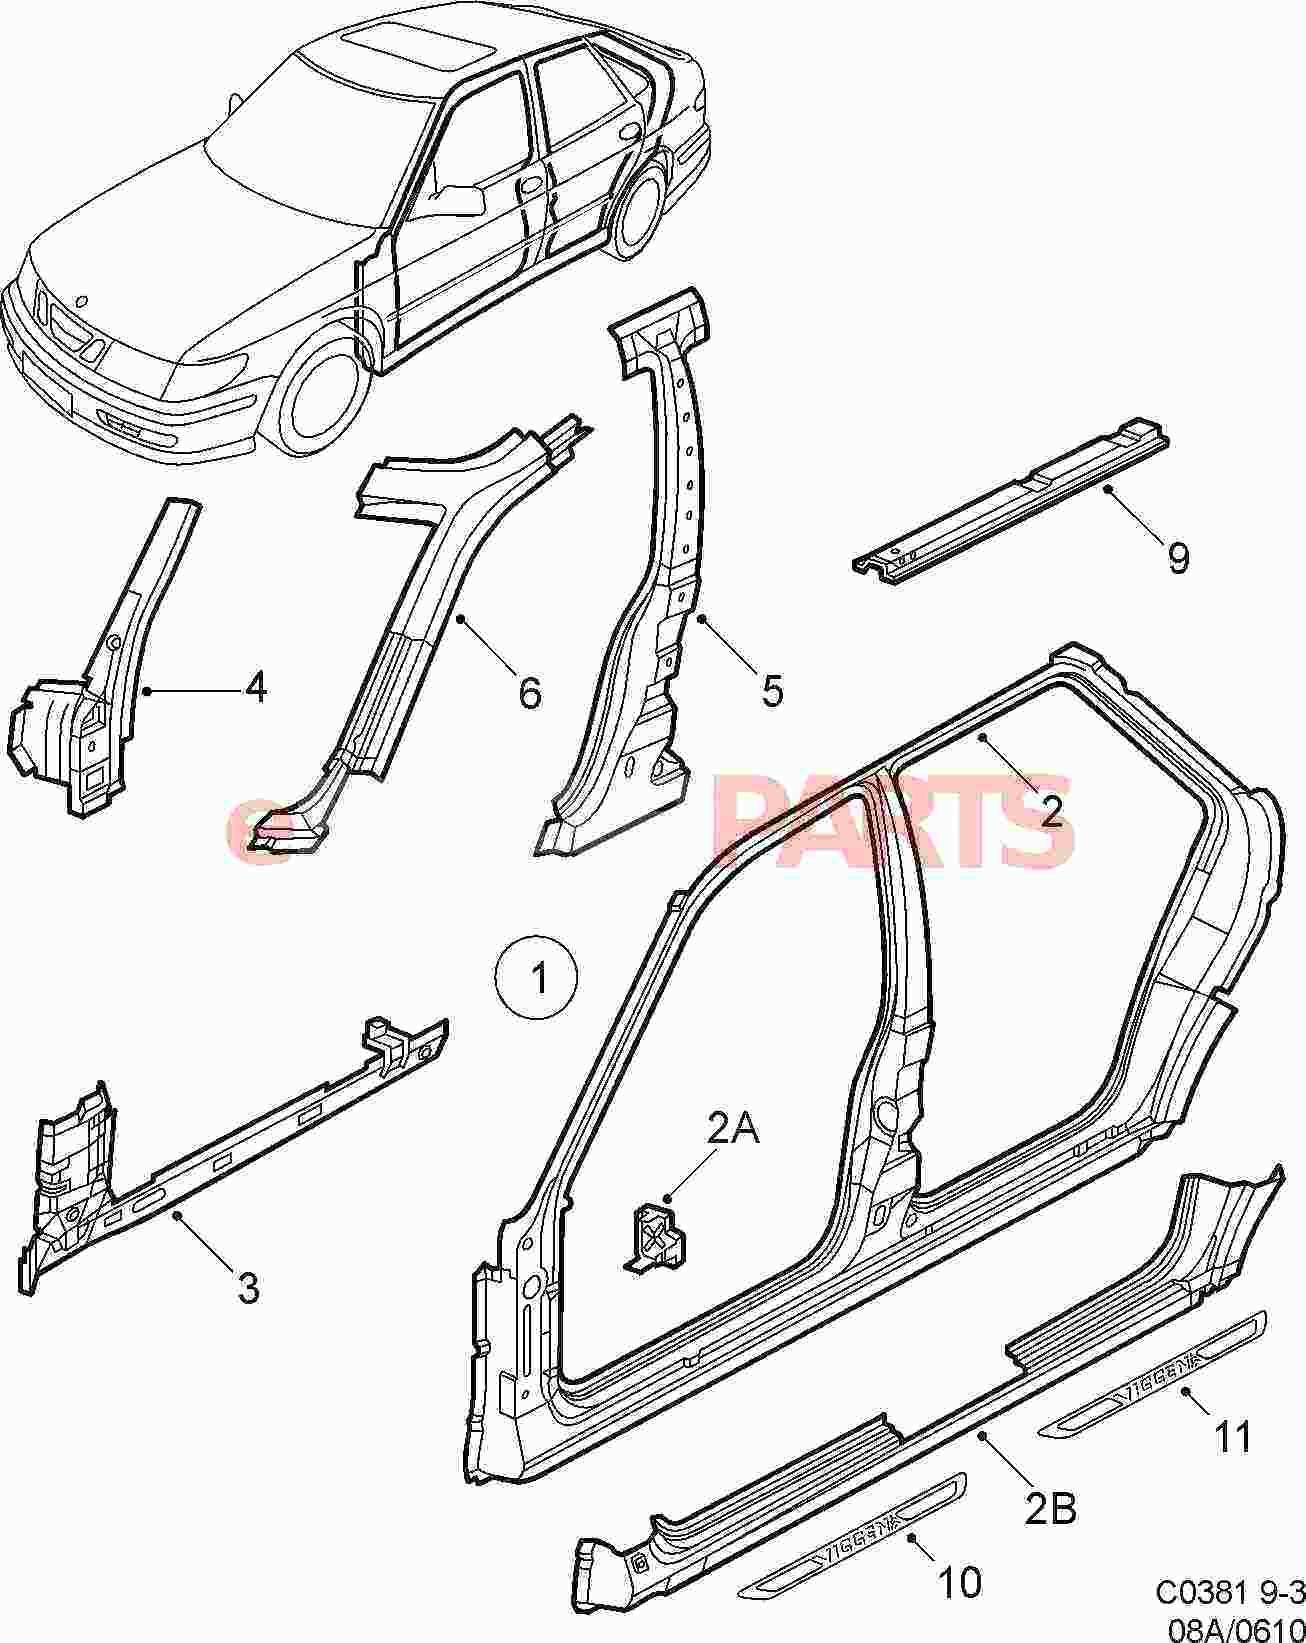 Car Body Drawing At Getdrawings